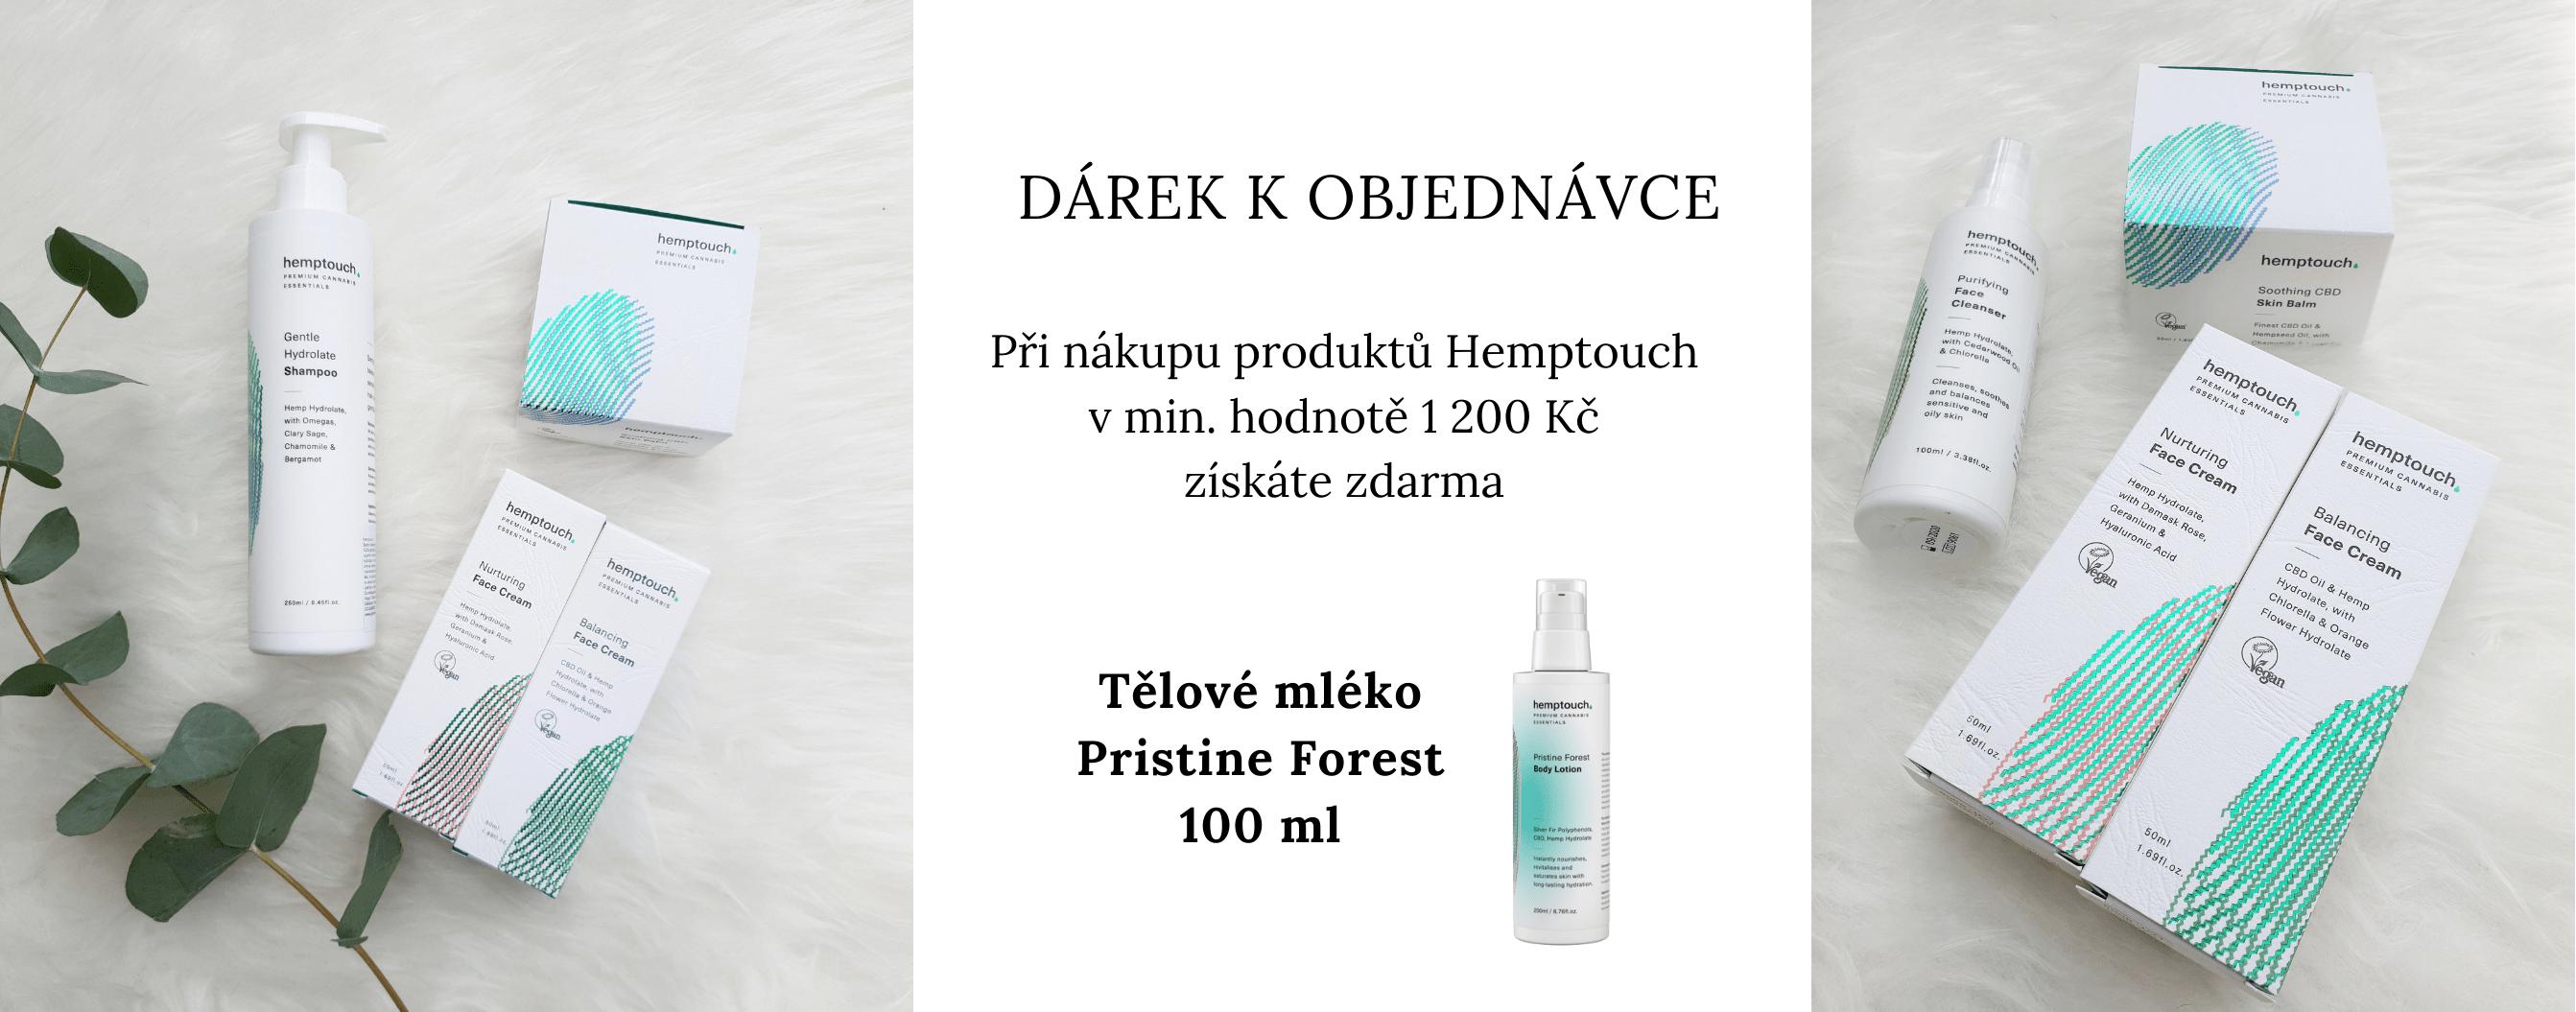 Pristine Forest dárek